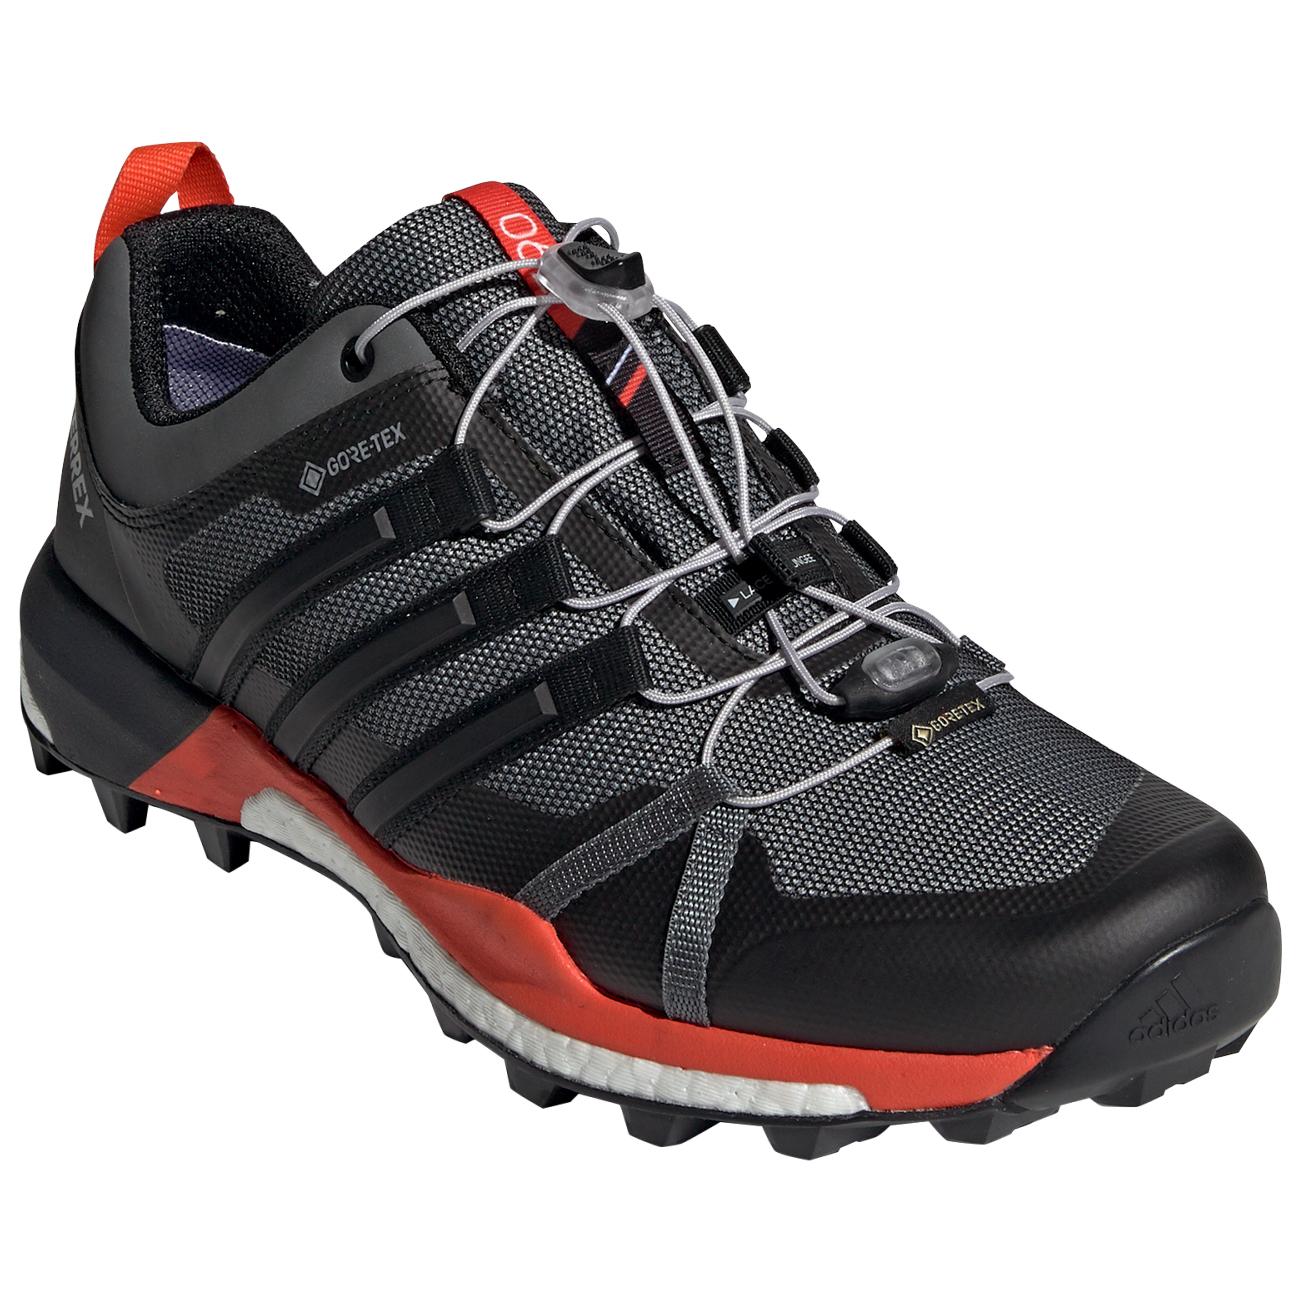 Adidas Terrex Skychaser GTX - Trail